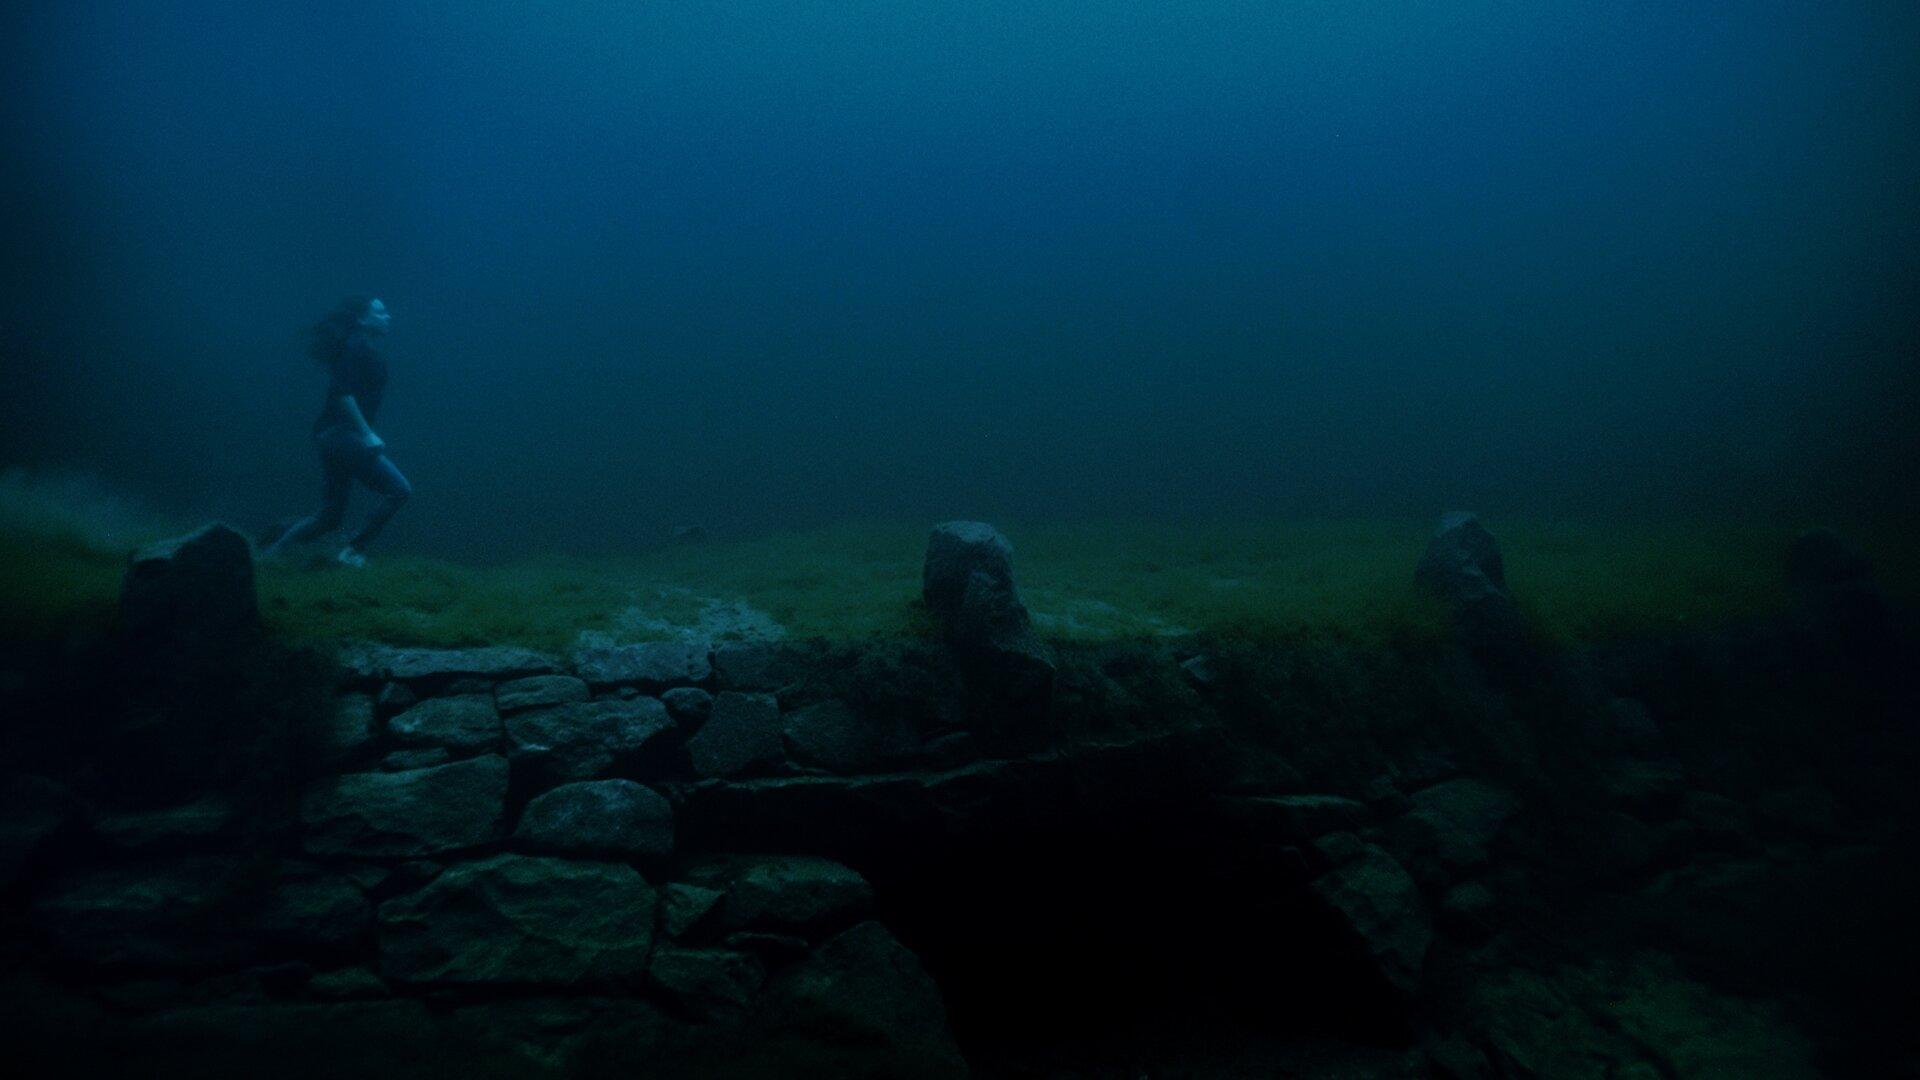 Rising Water_1.1.67.jpg